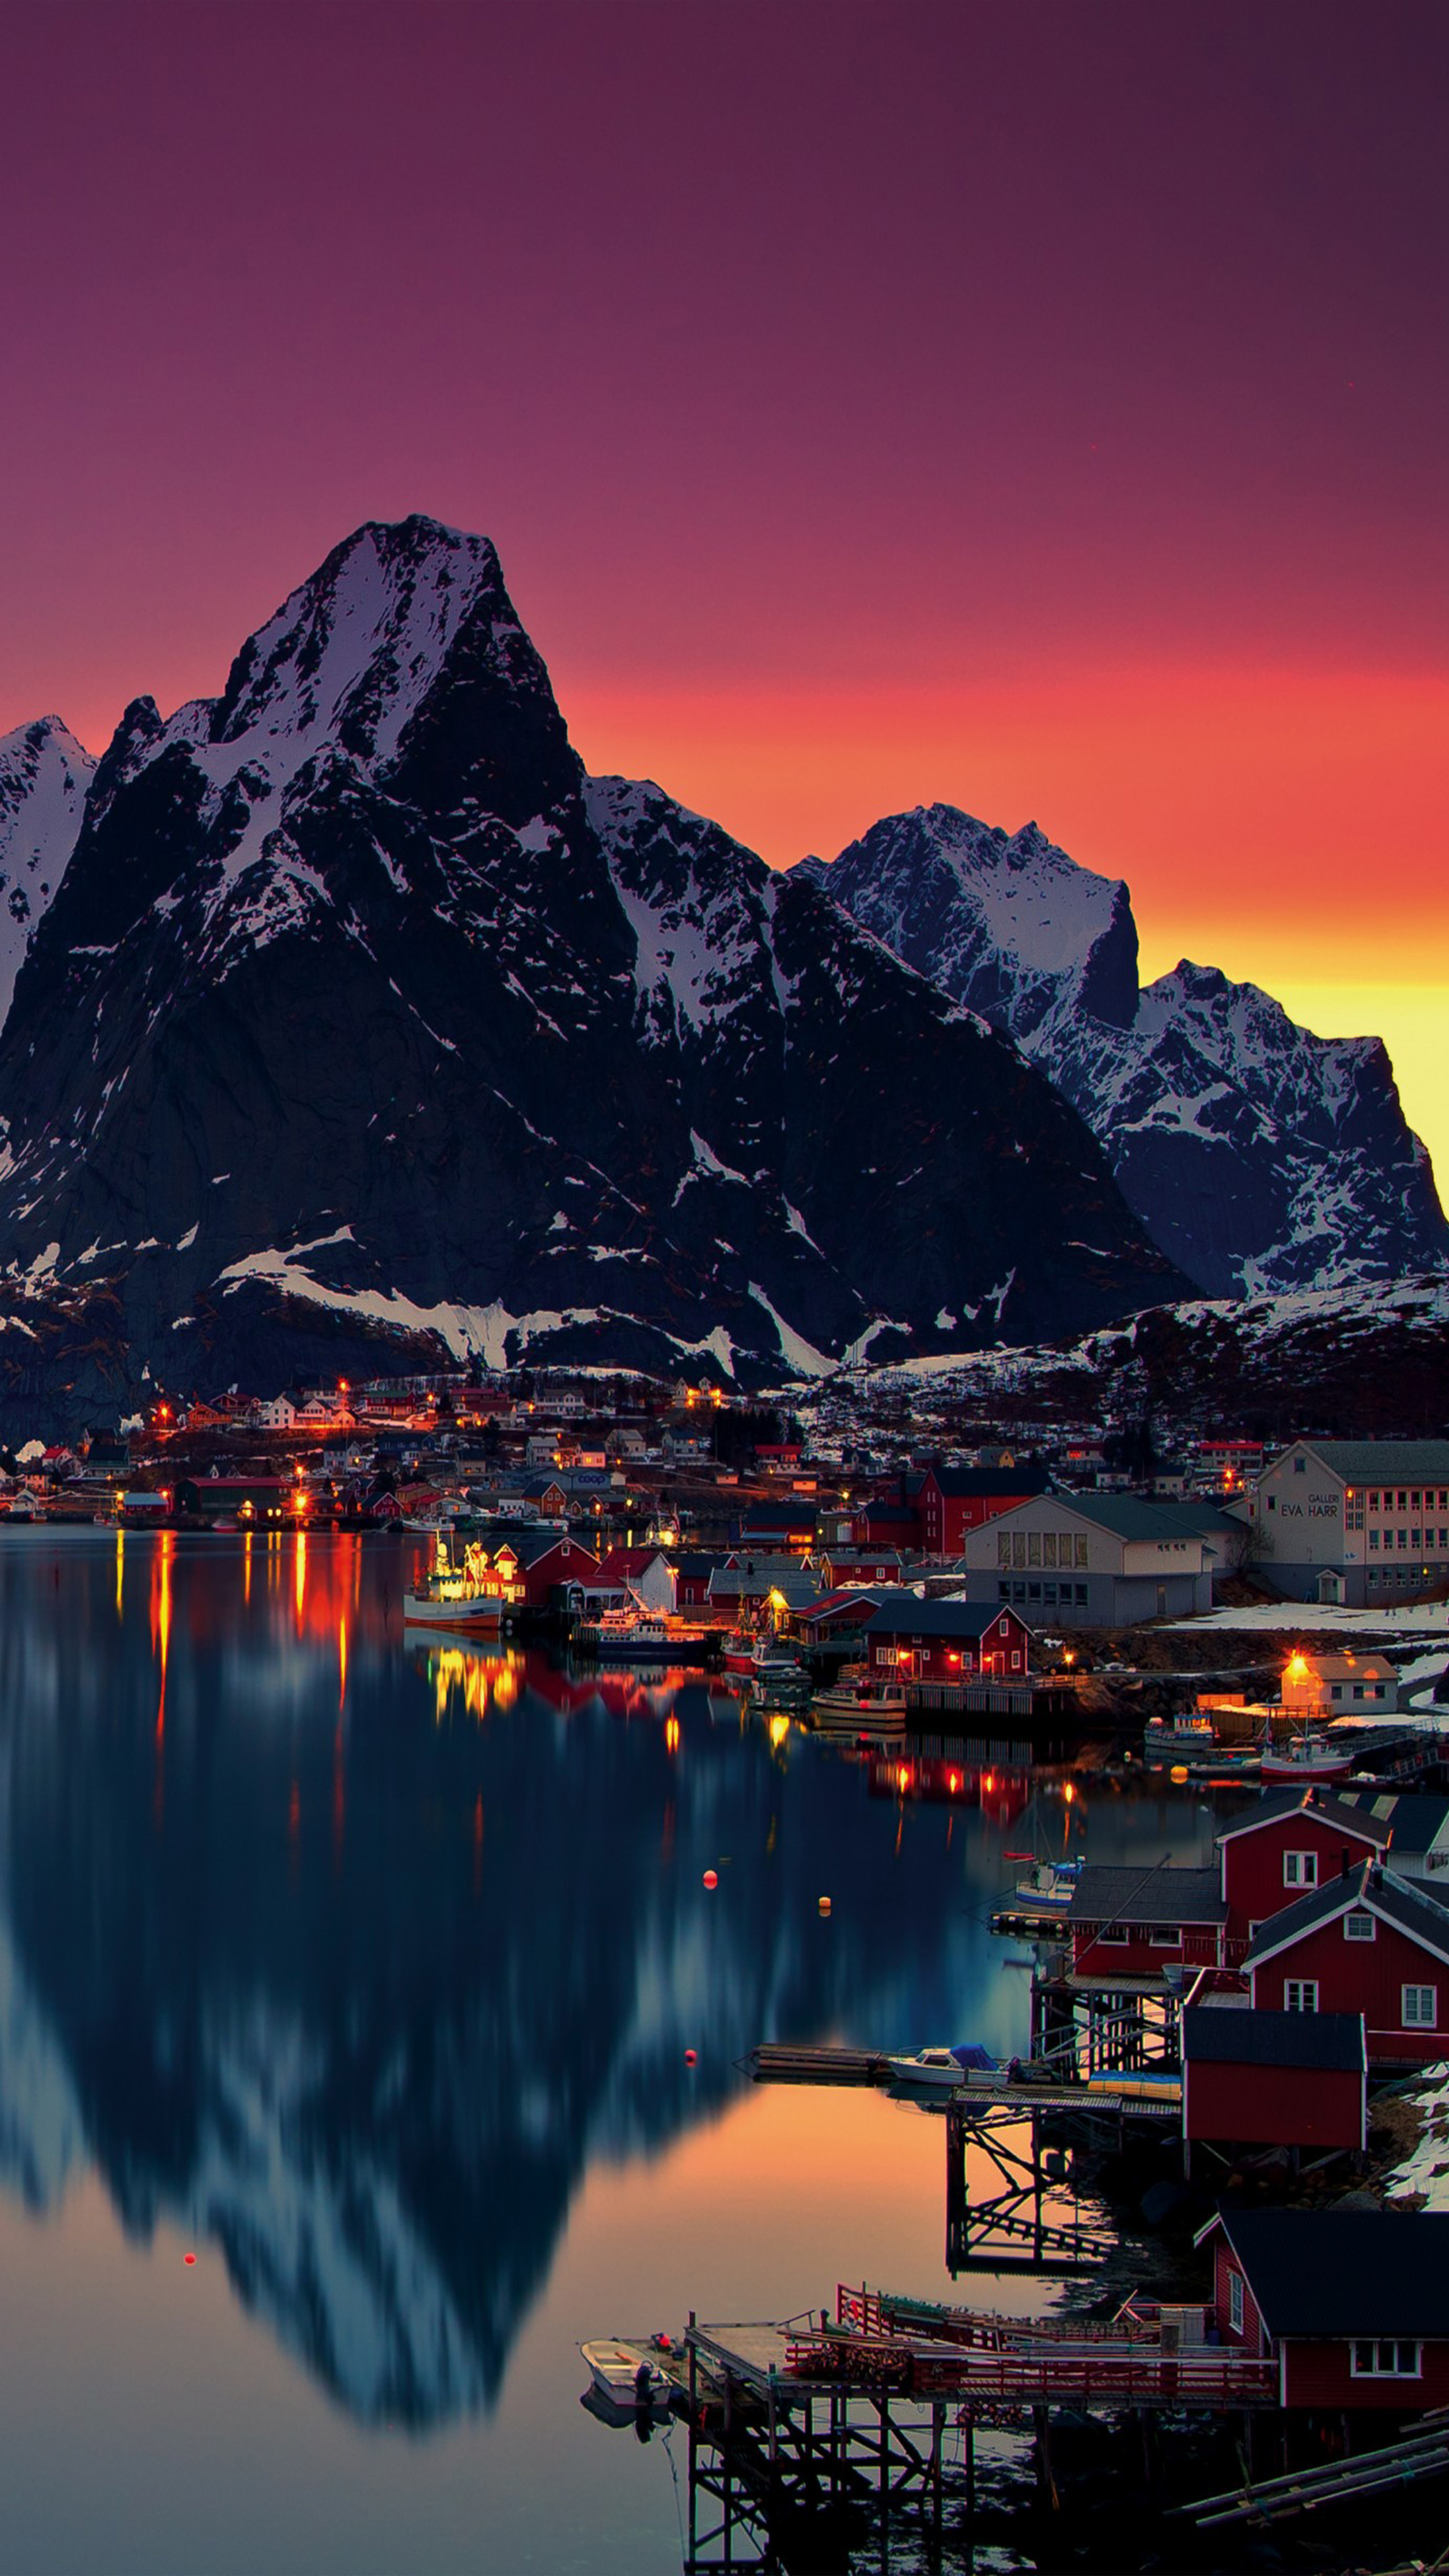 Download lofoten islands norway mountains sunrise free - 4k love wallpaper for mobile ...